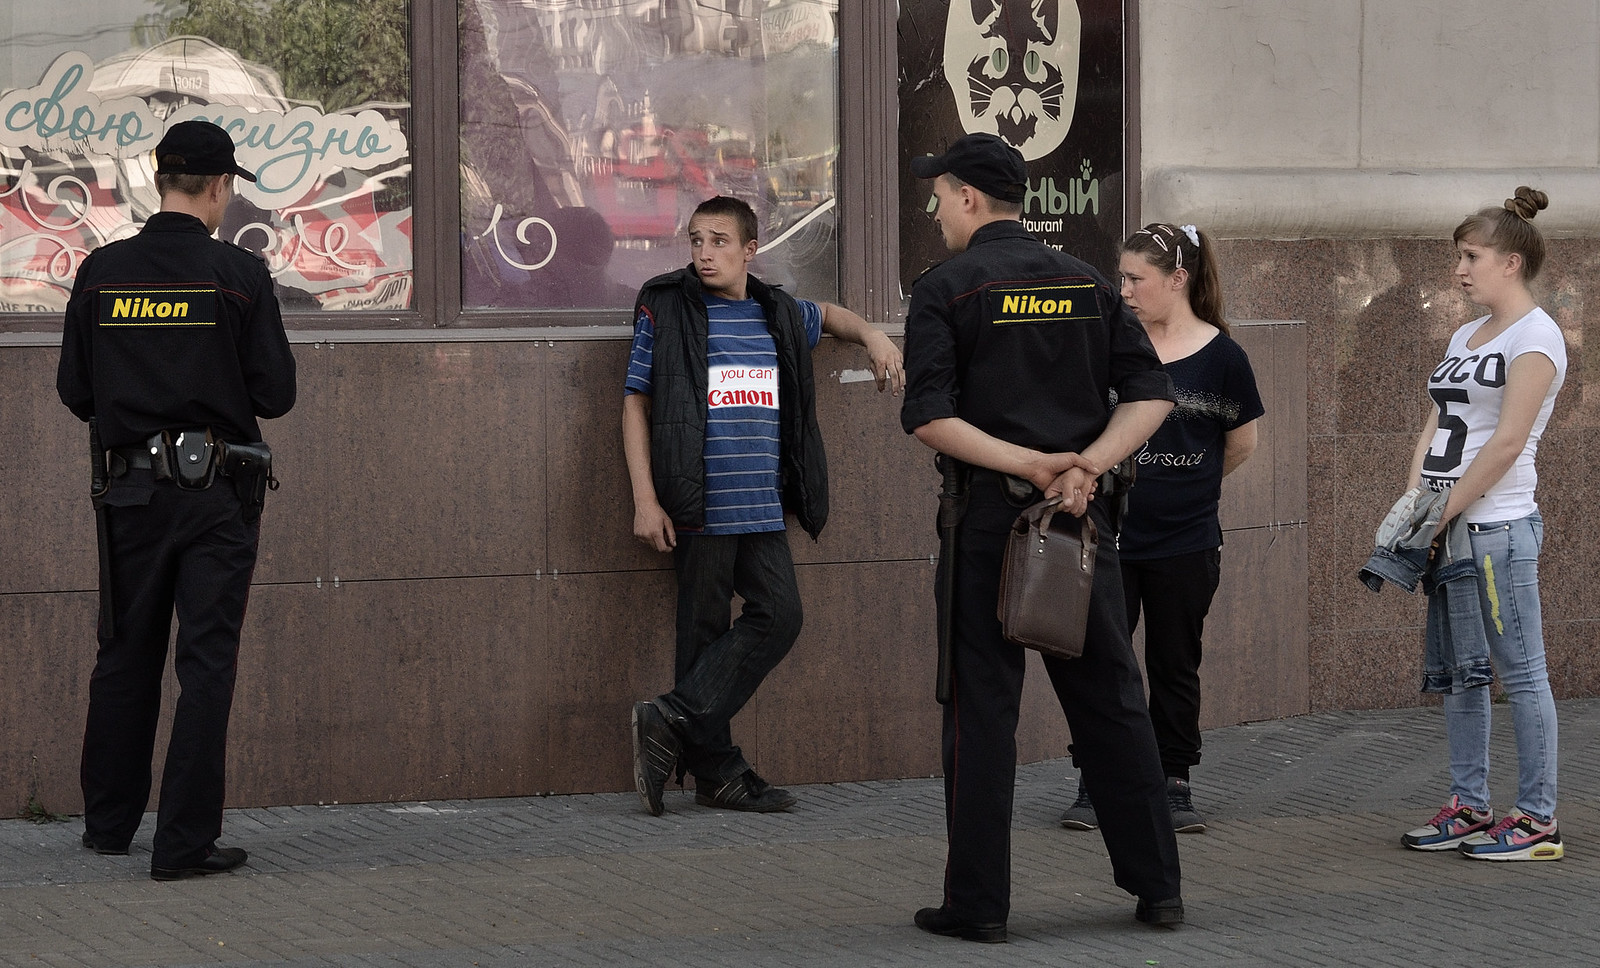 стрит фотограф Челябинск - canon vs nikon